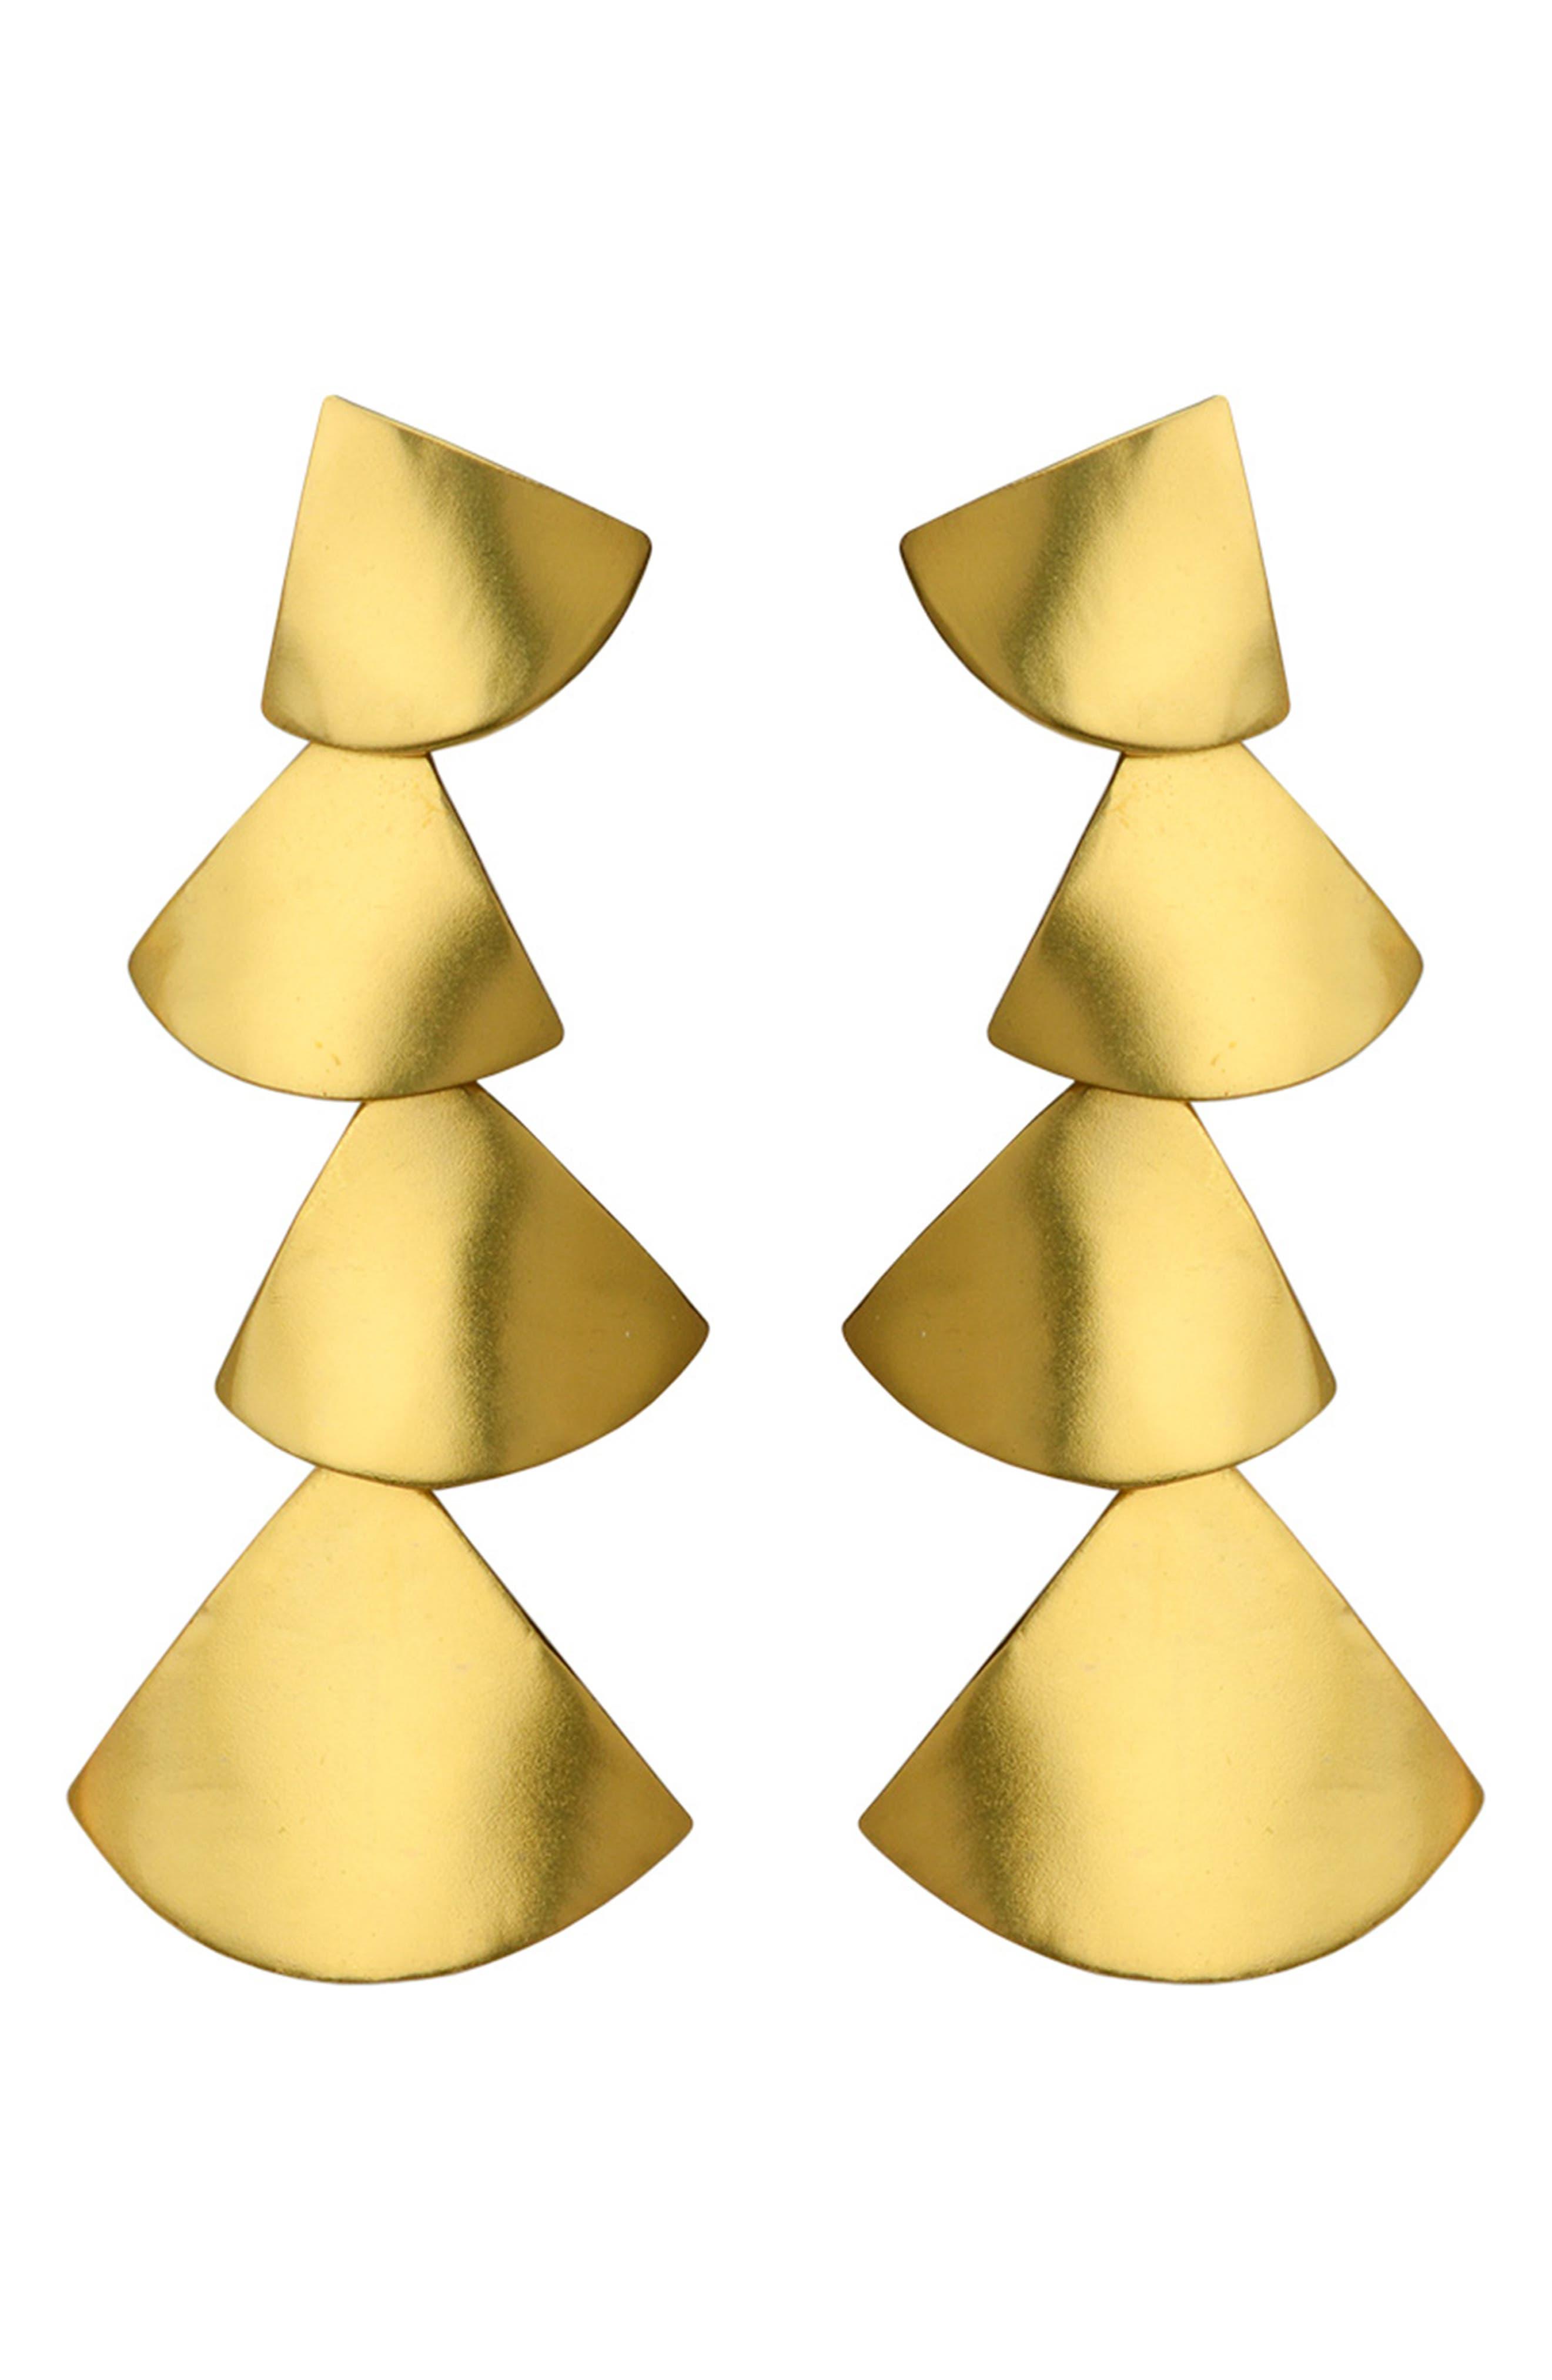 Queen Drop Earrings,                             Main thumbnail 1, color,                             BRASS